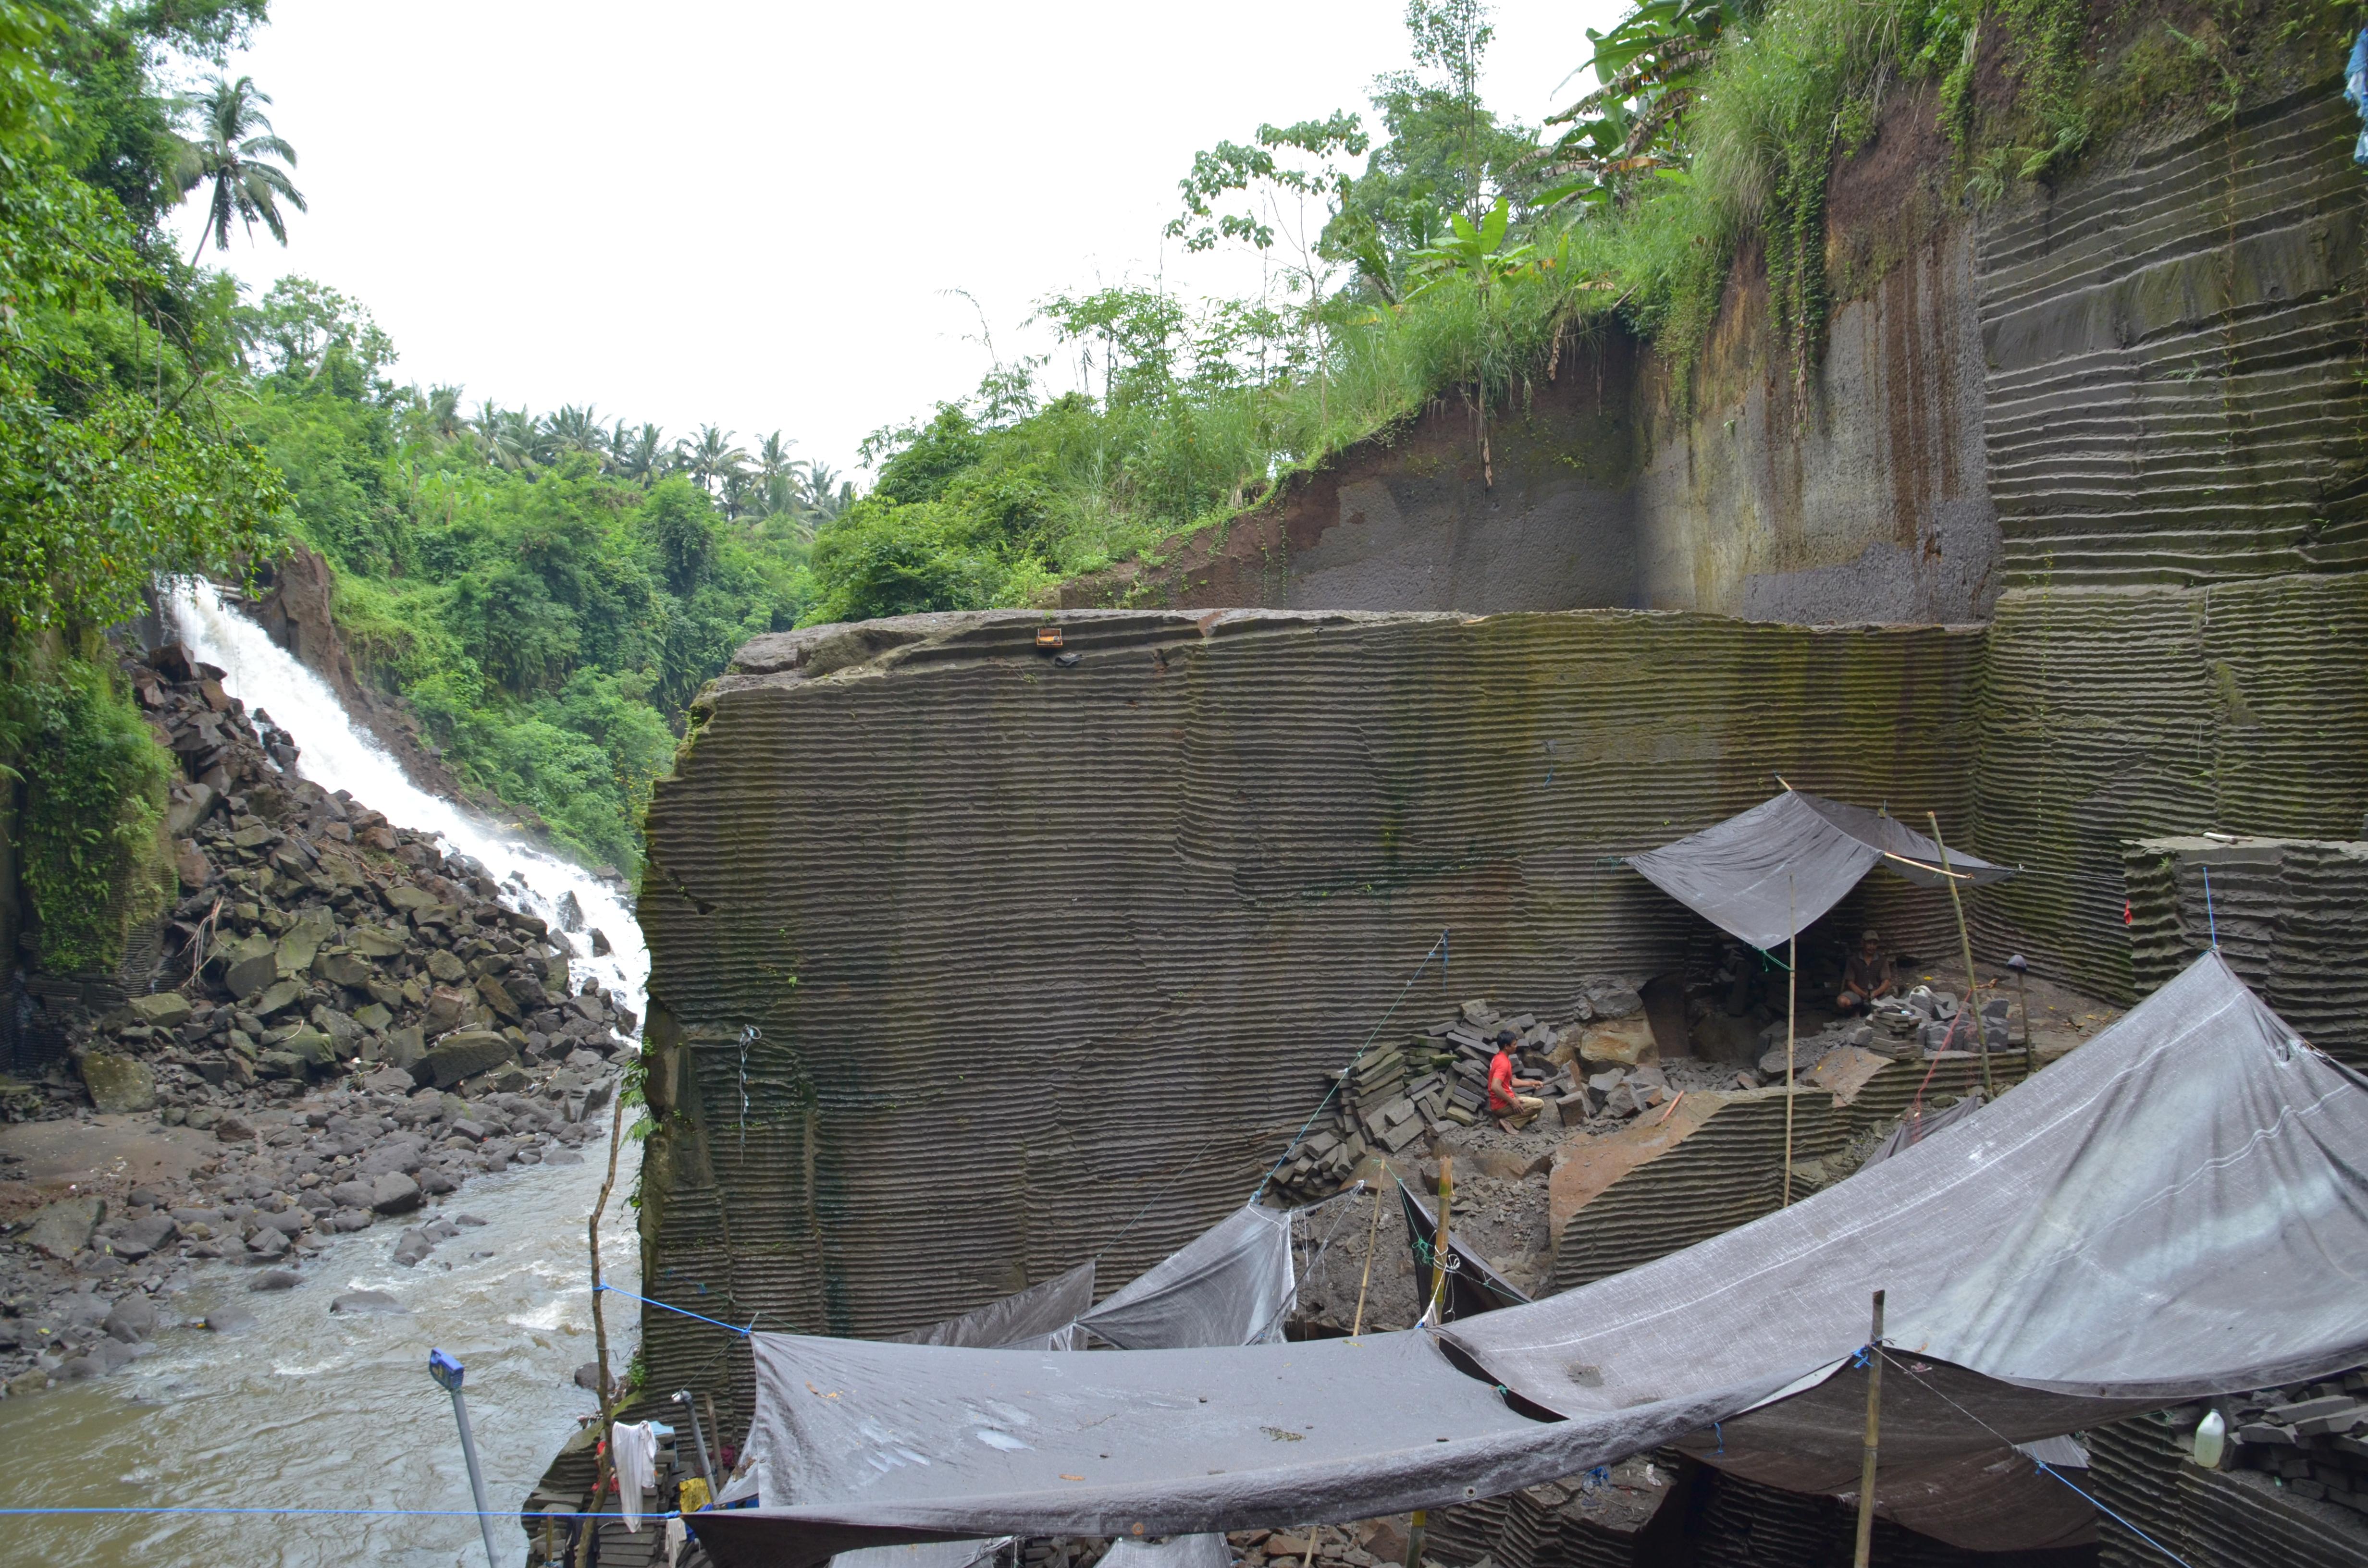 04.03.01_Mining Impacts_004